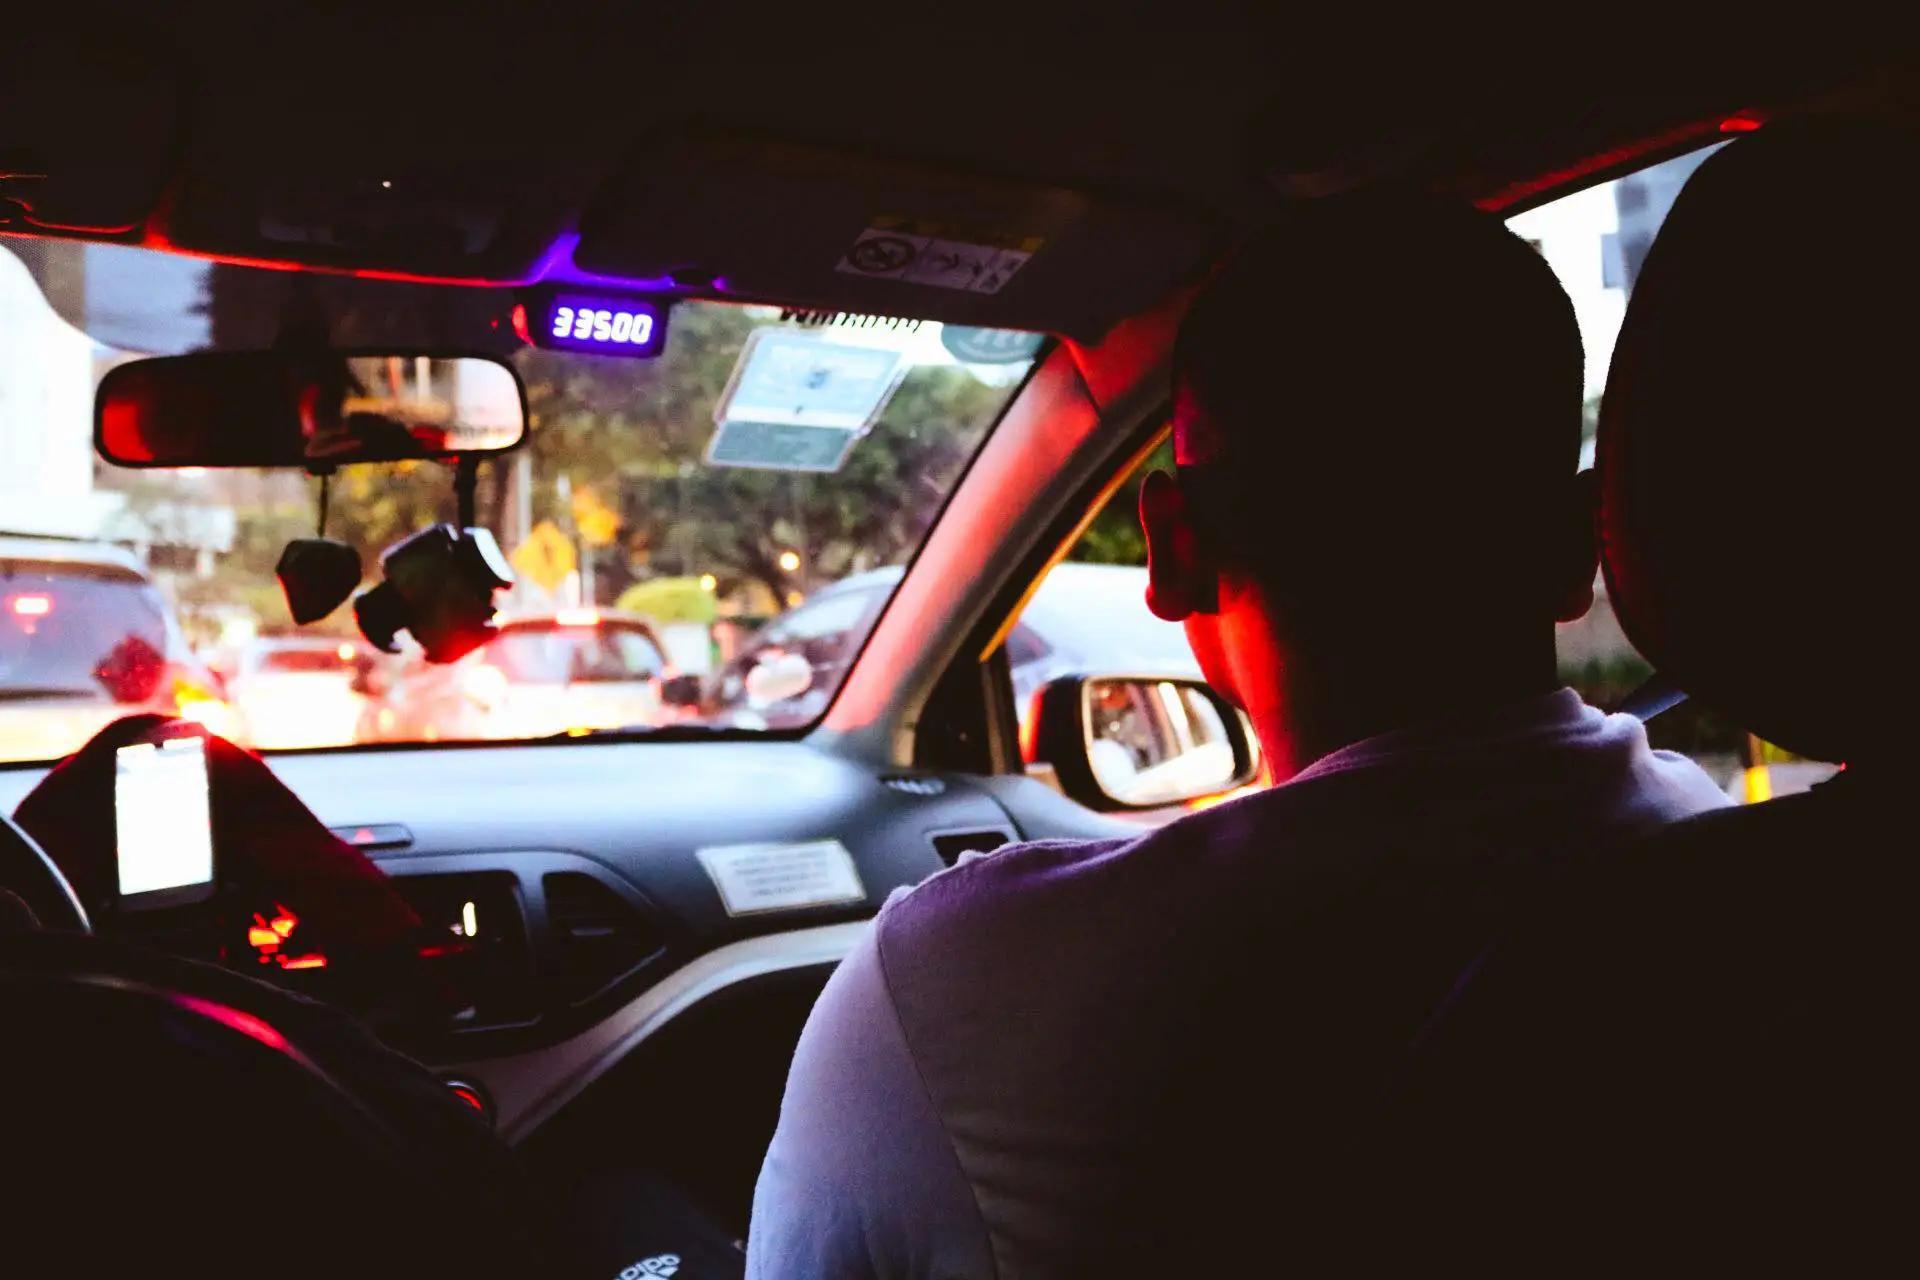 Taxi-Ride